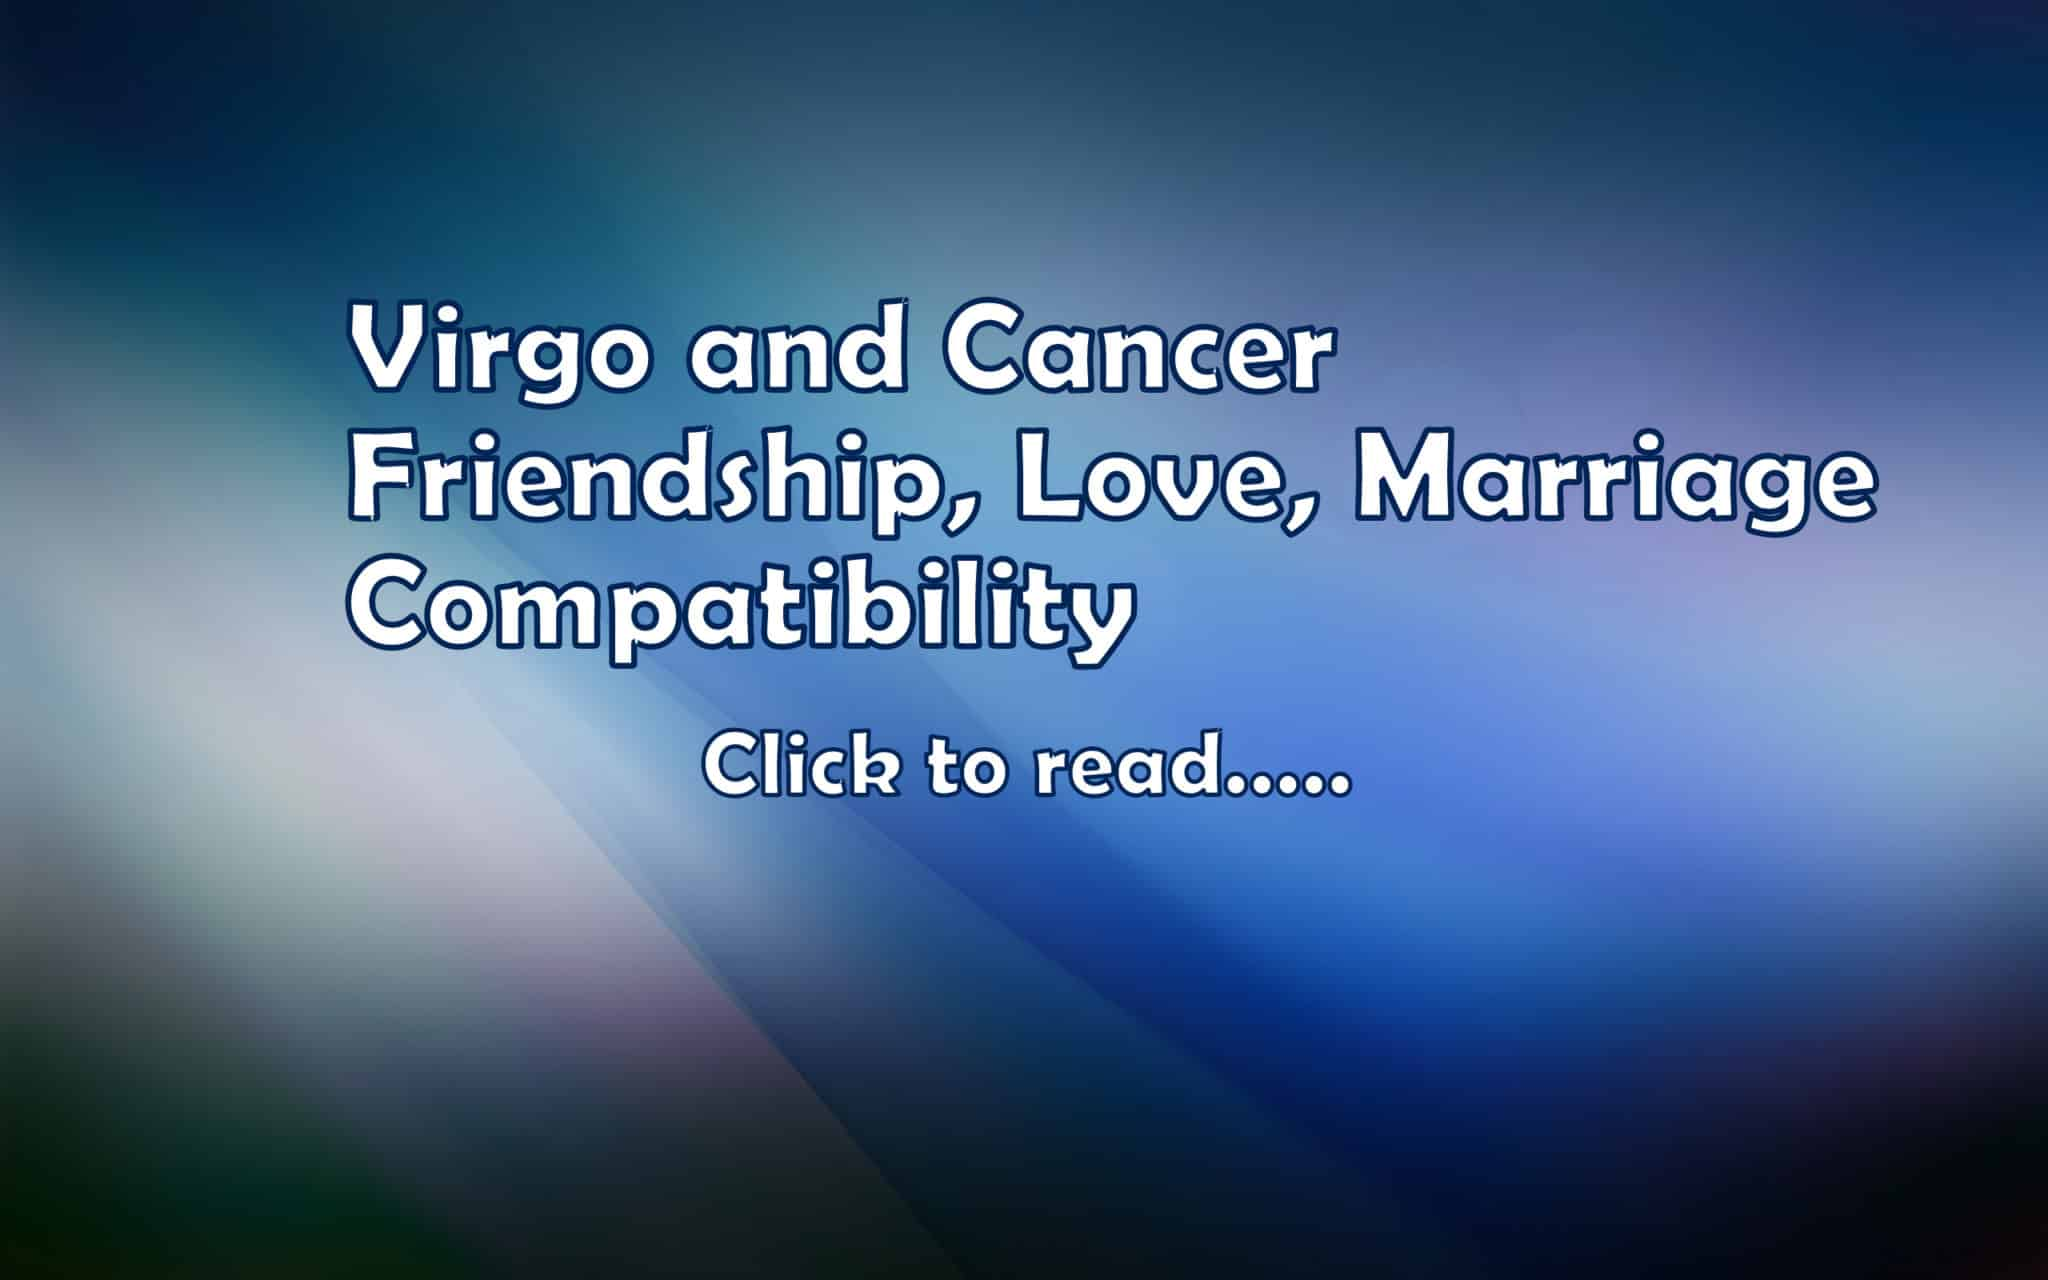 Virgo and virgo friendship